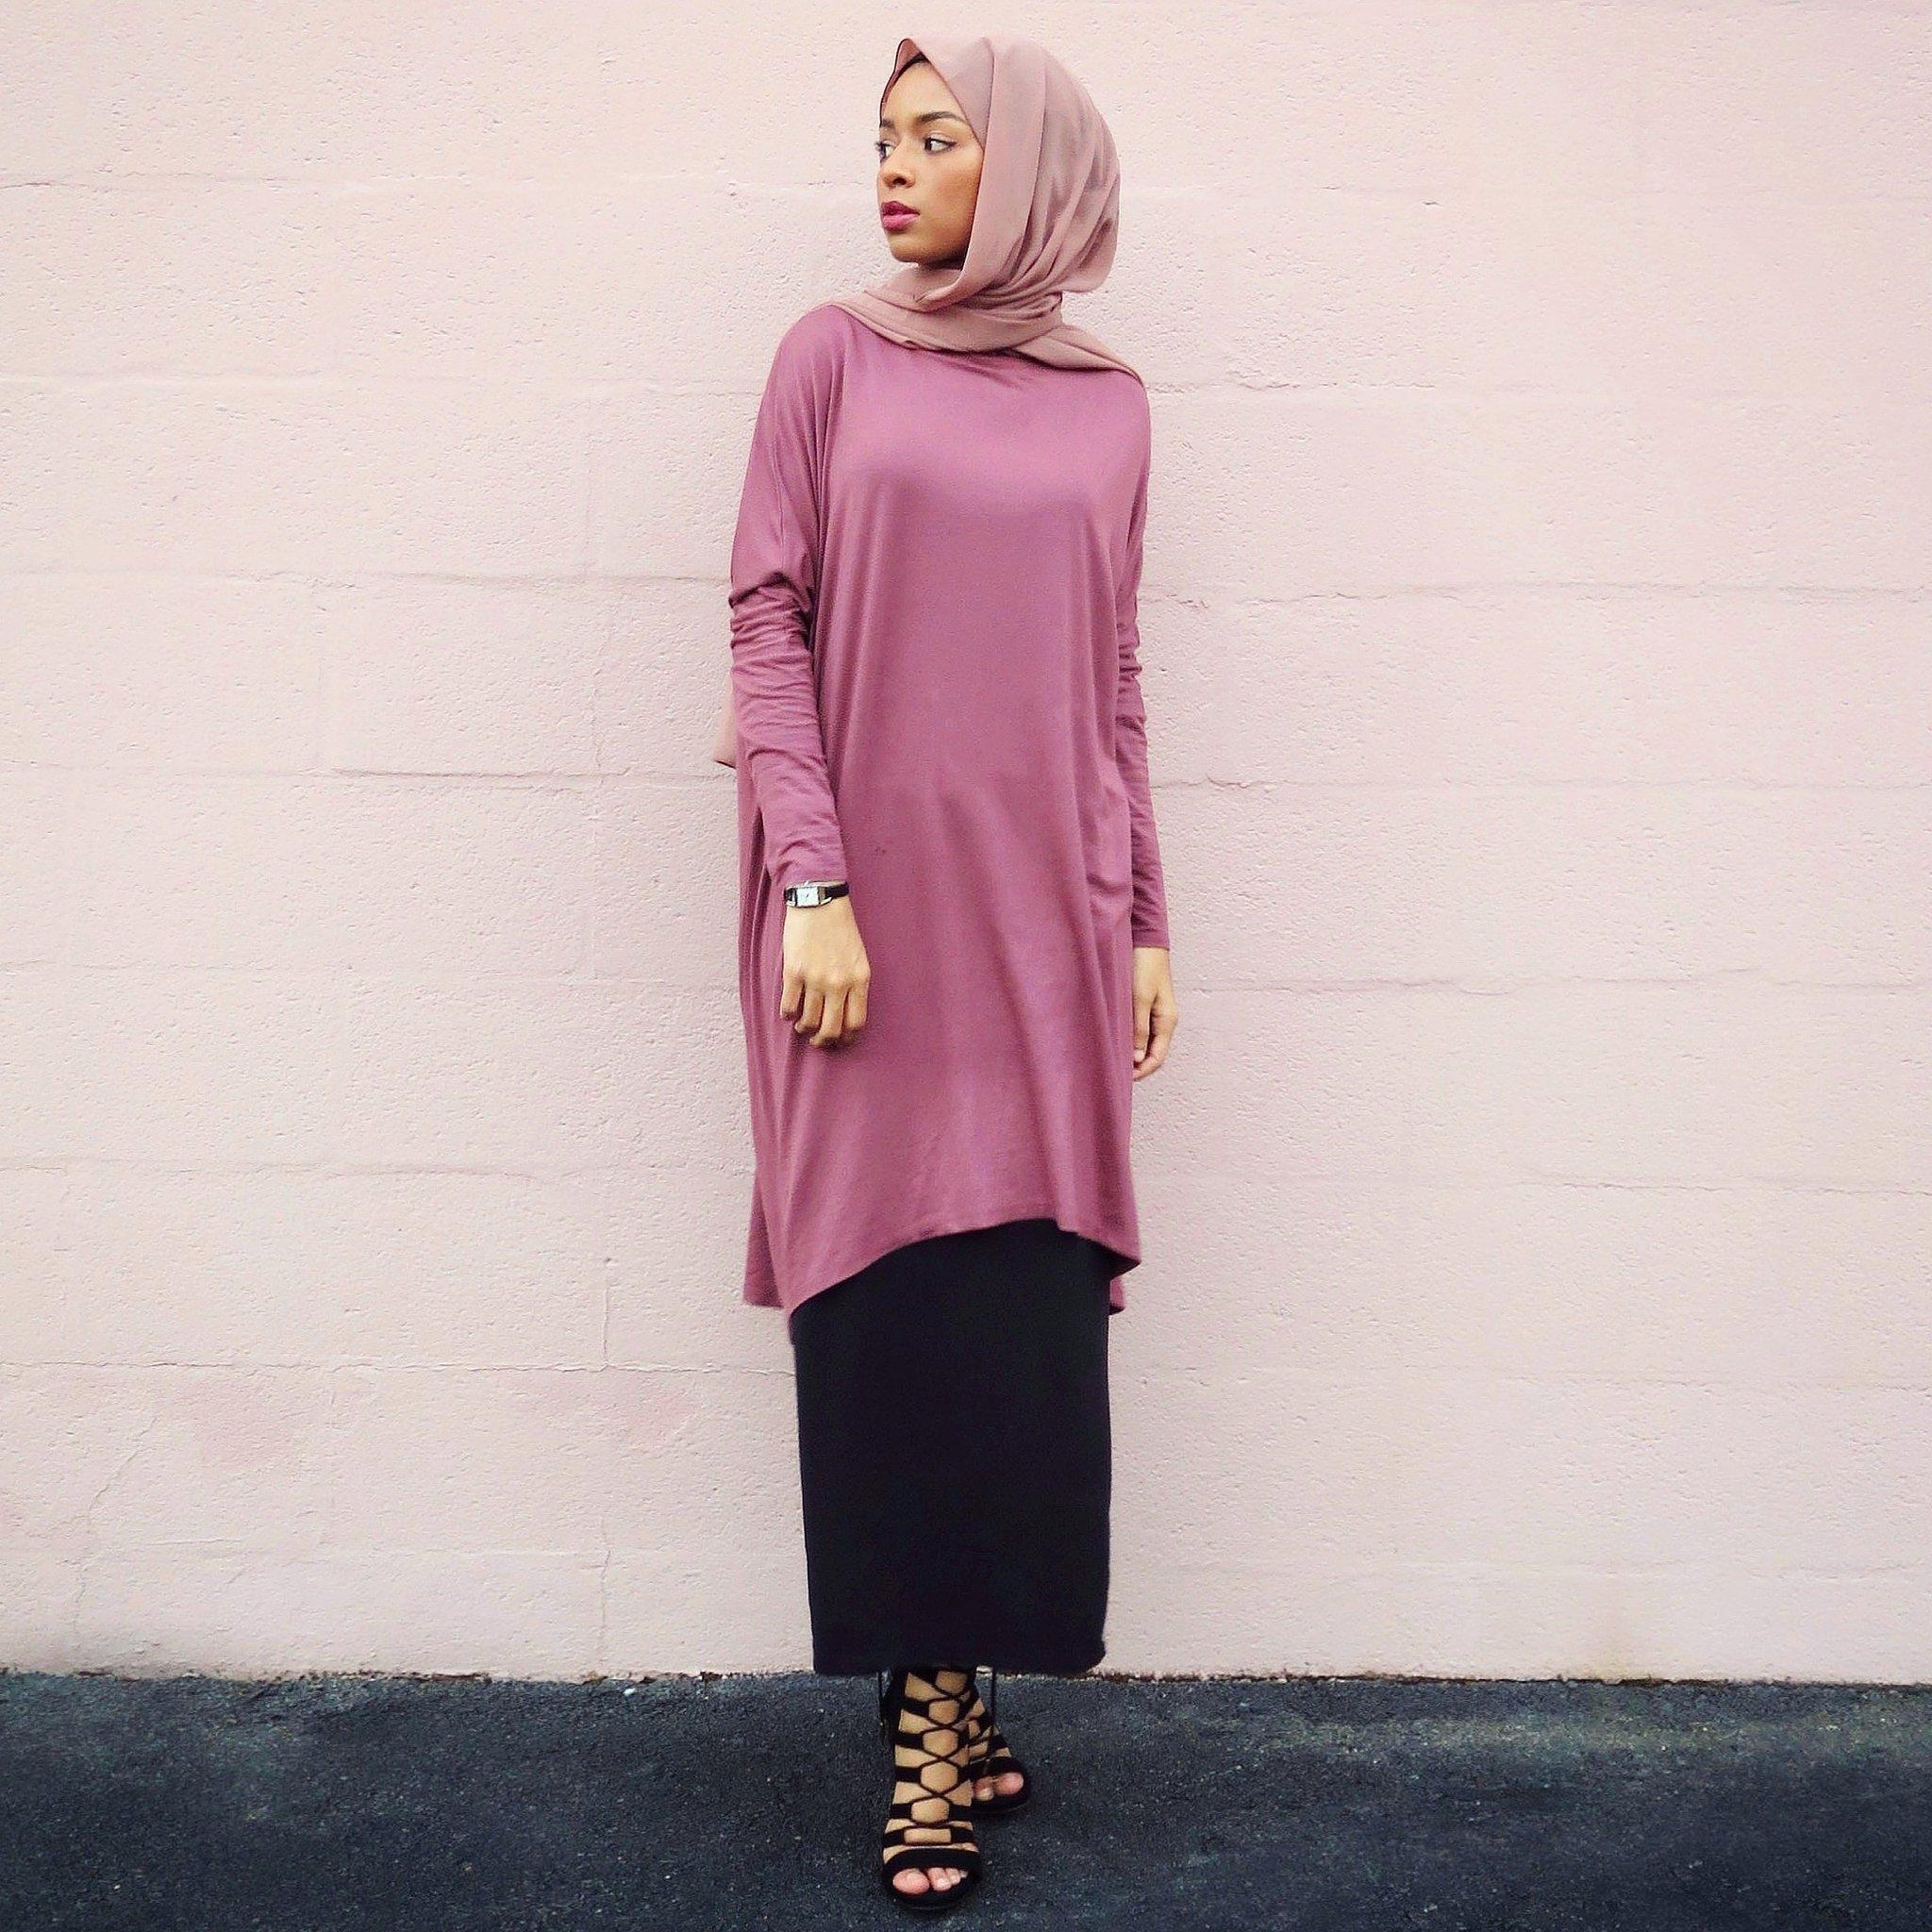 encounter 3: saufeeya of hijab fashion LNKIQSO